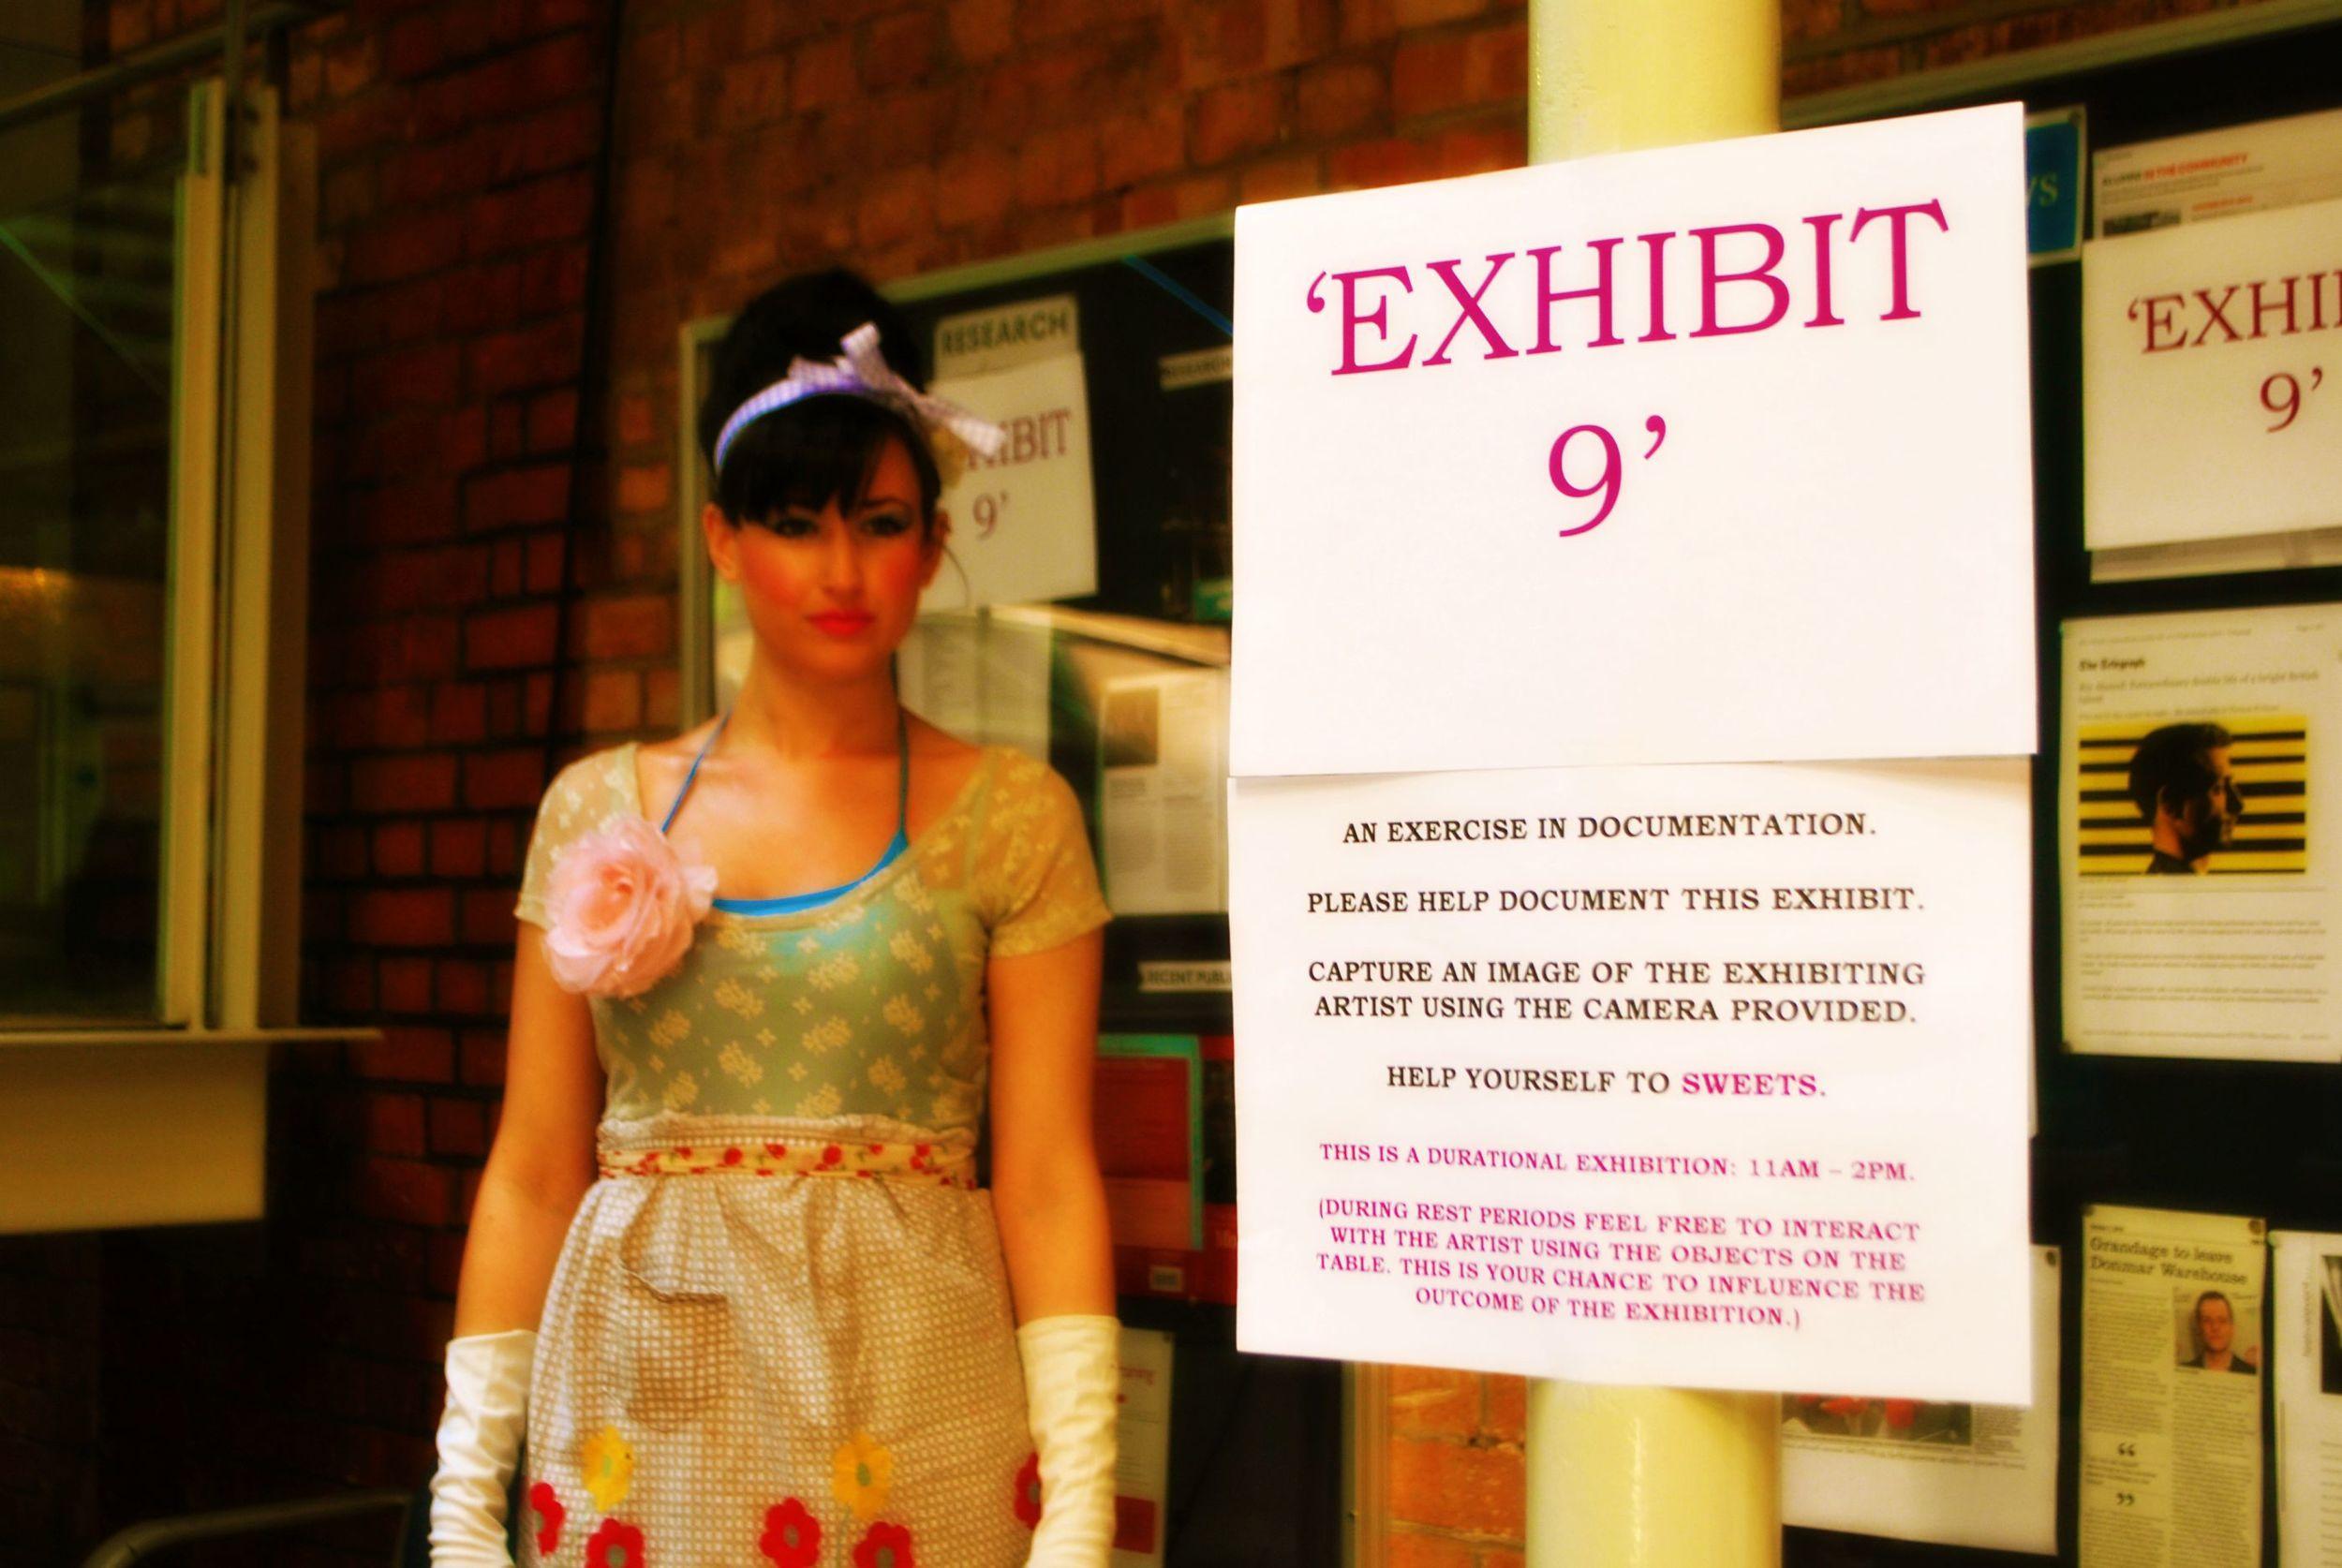 exhibit9.jpg